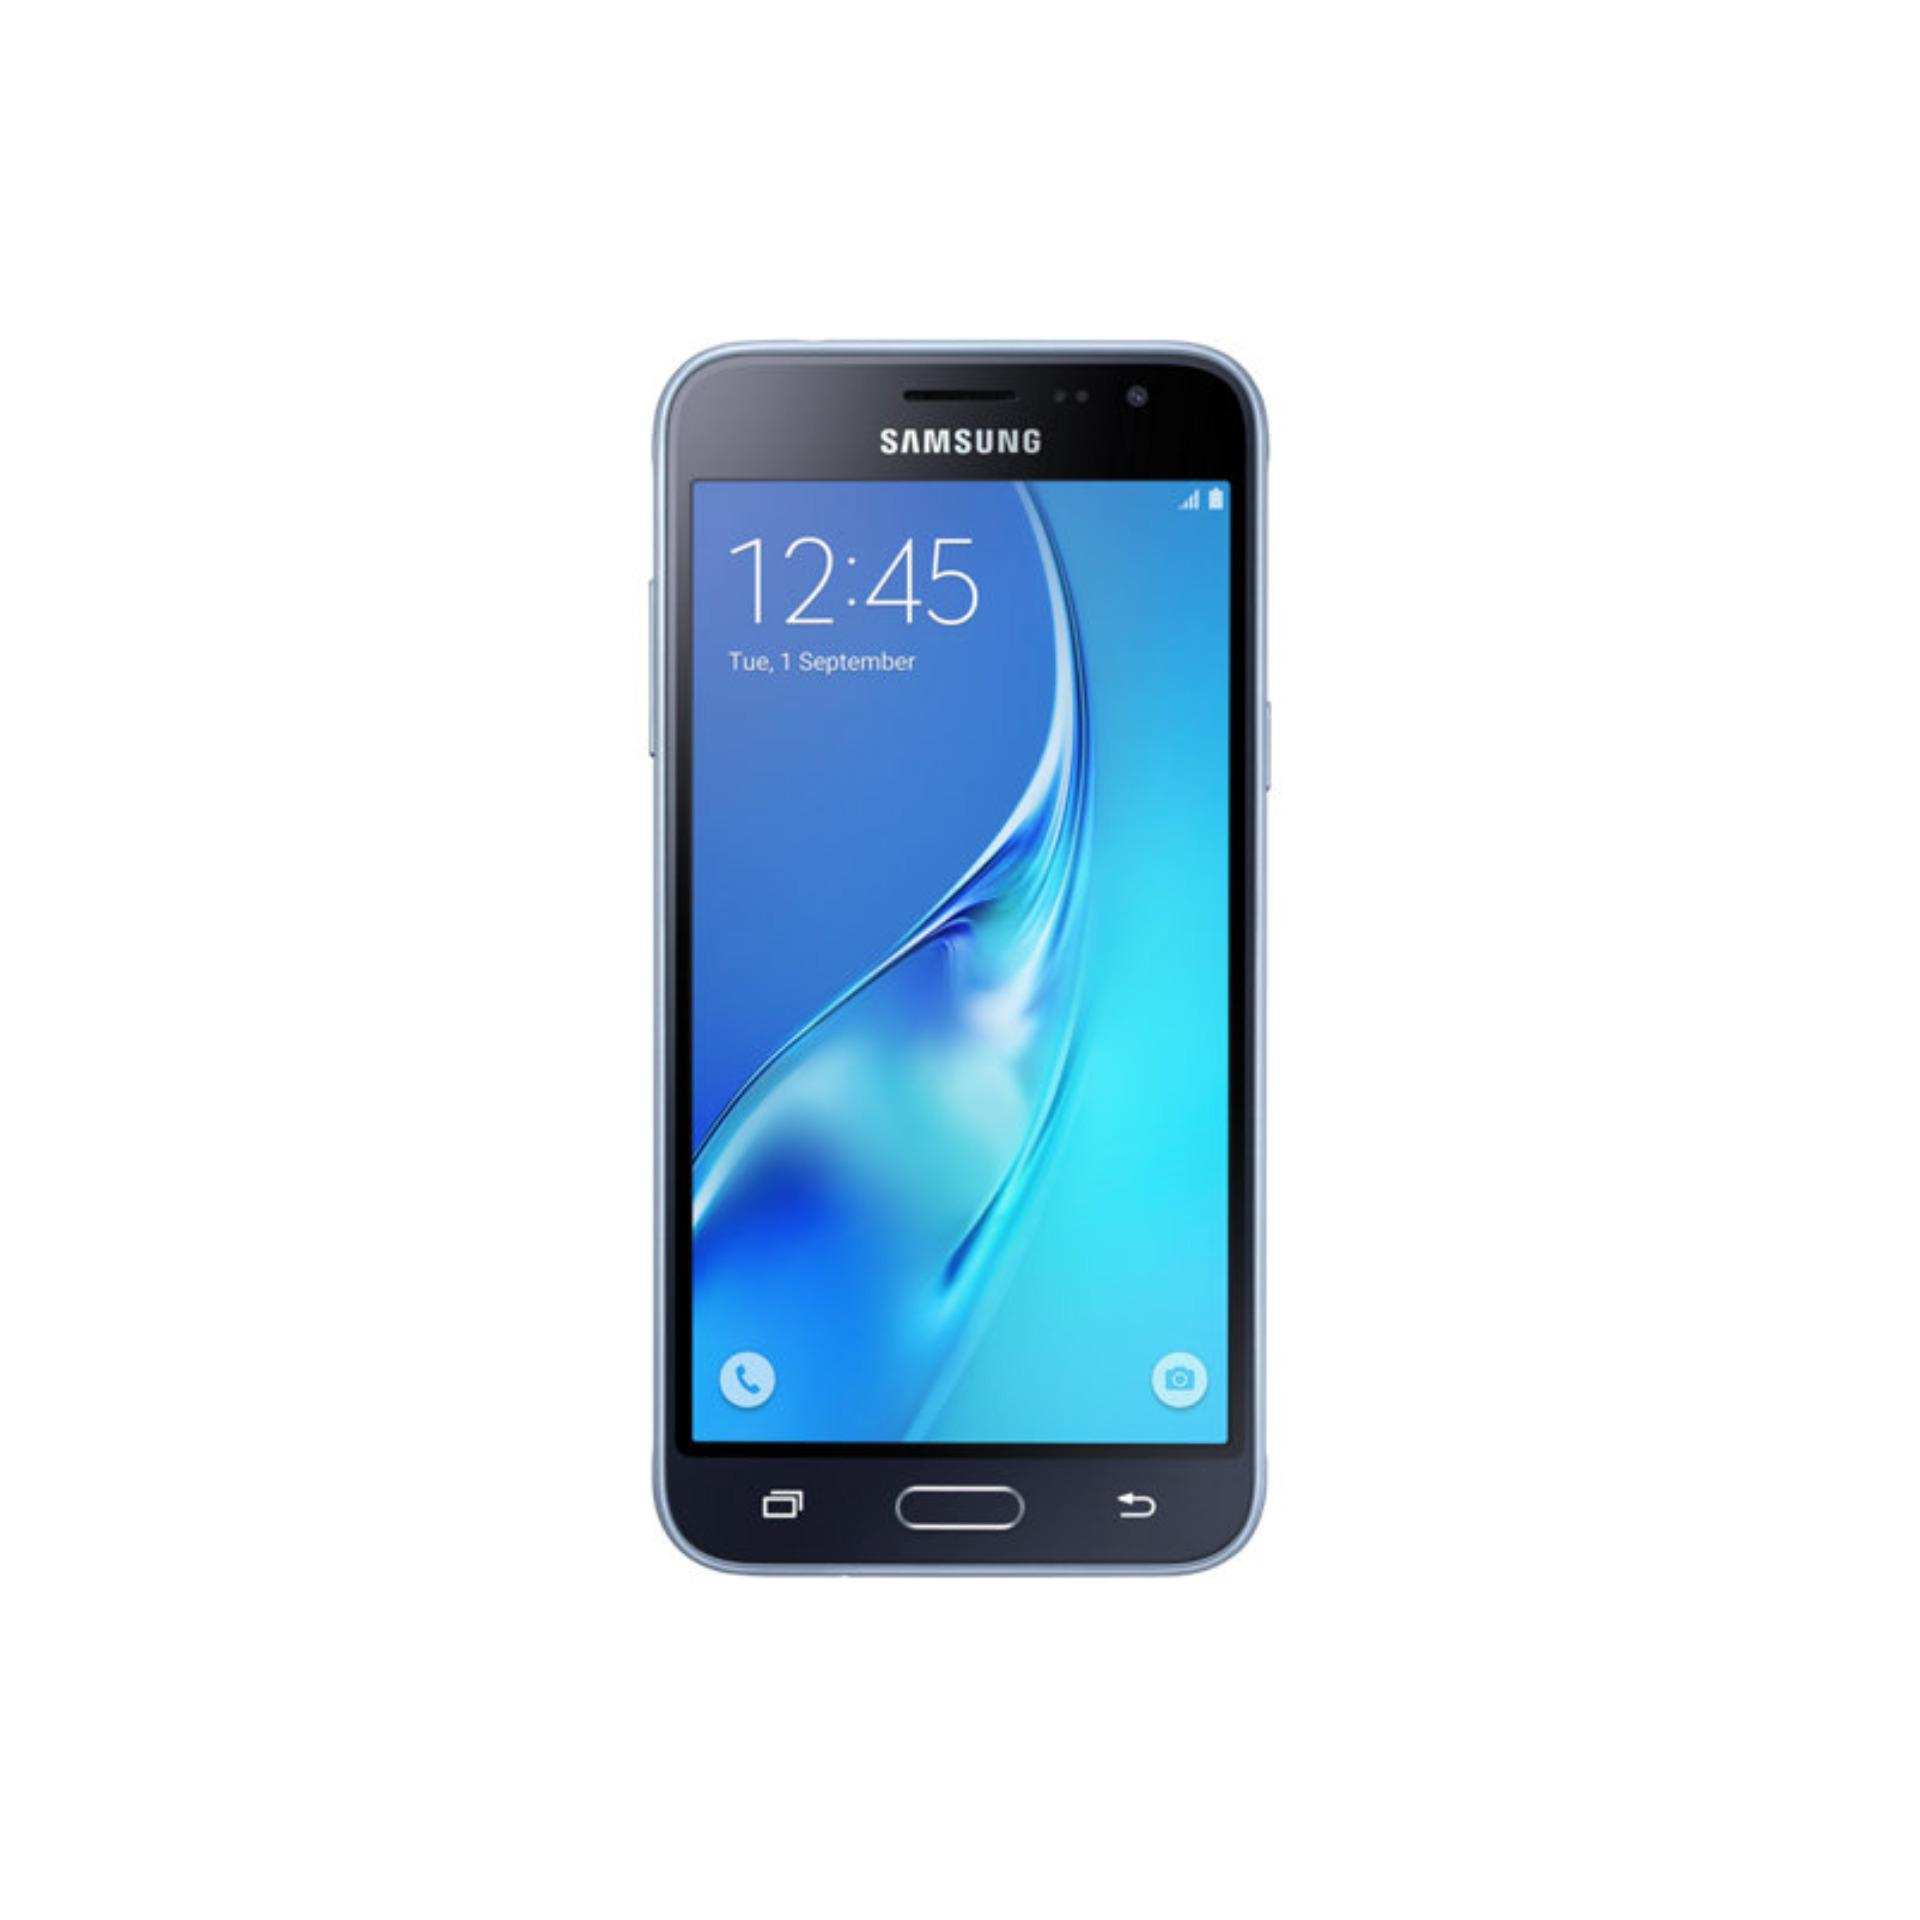 Toko Samsung Galaxy J3 2016 Smartphone 8Gb 1 5Gb Lengkap Di Indonesia